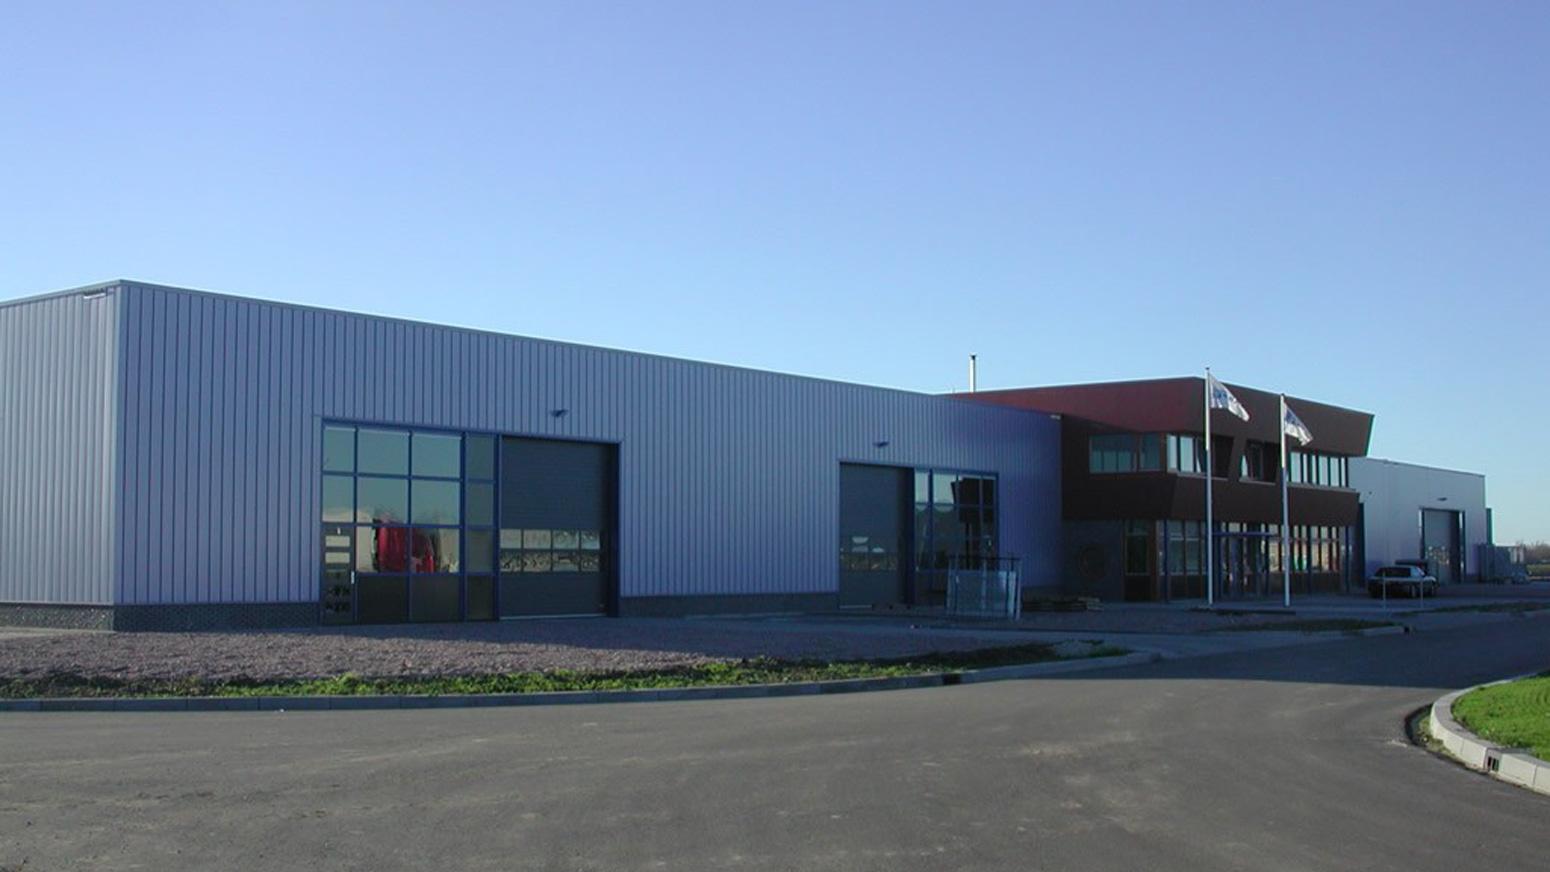 Voorzijde Timmerfabriek Carper in Obdam